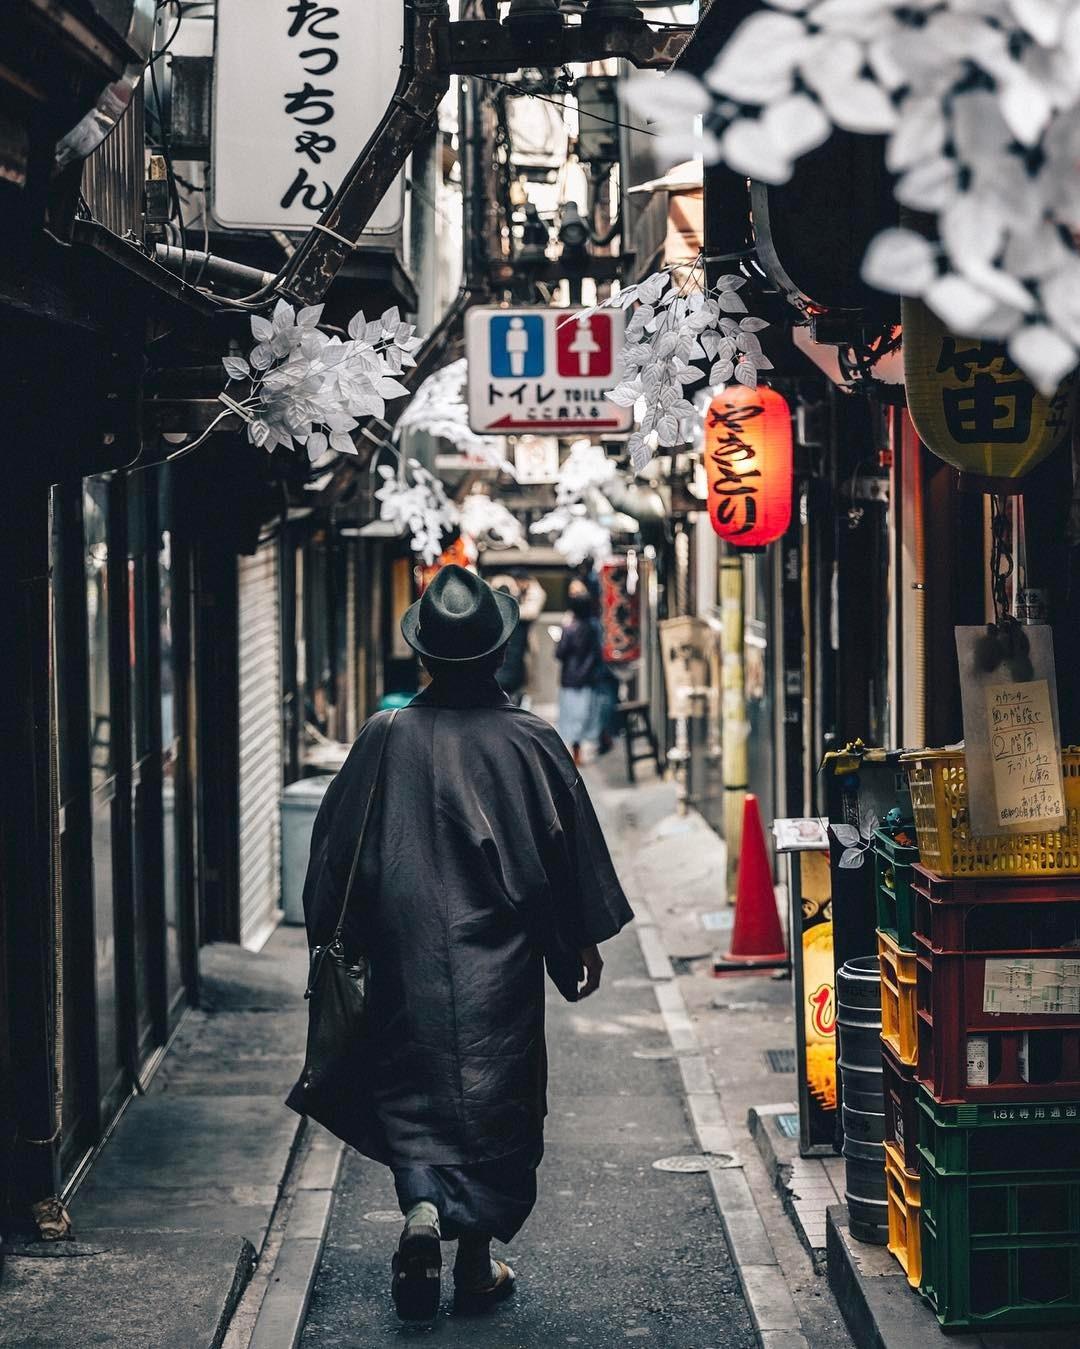 Vibrant Yoshiro Ishii - Japan, Instagram - photogrist | ello